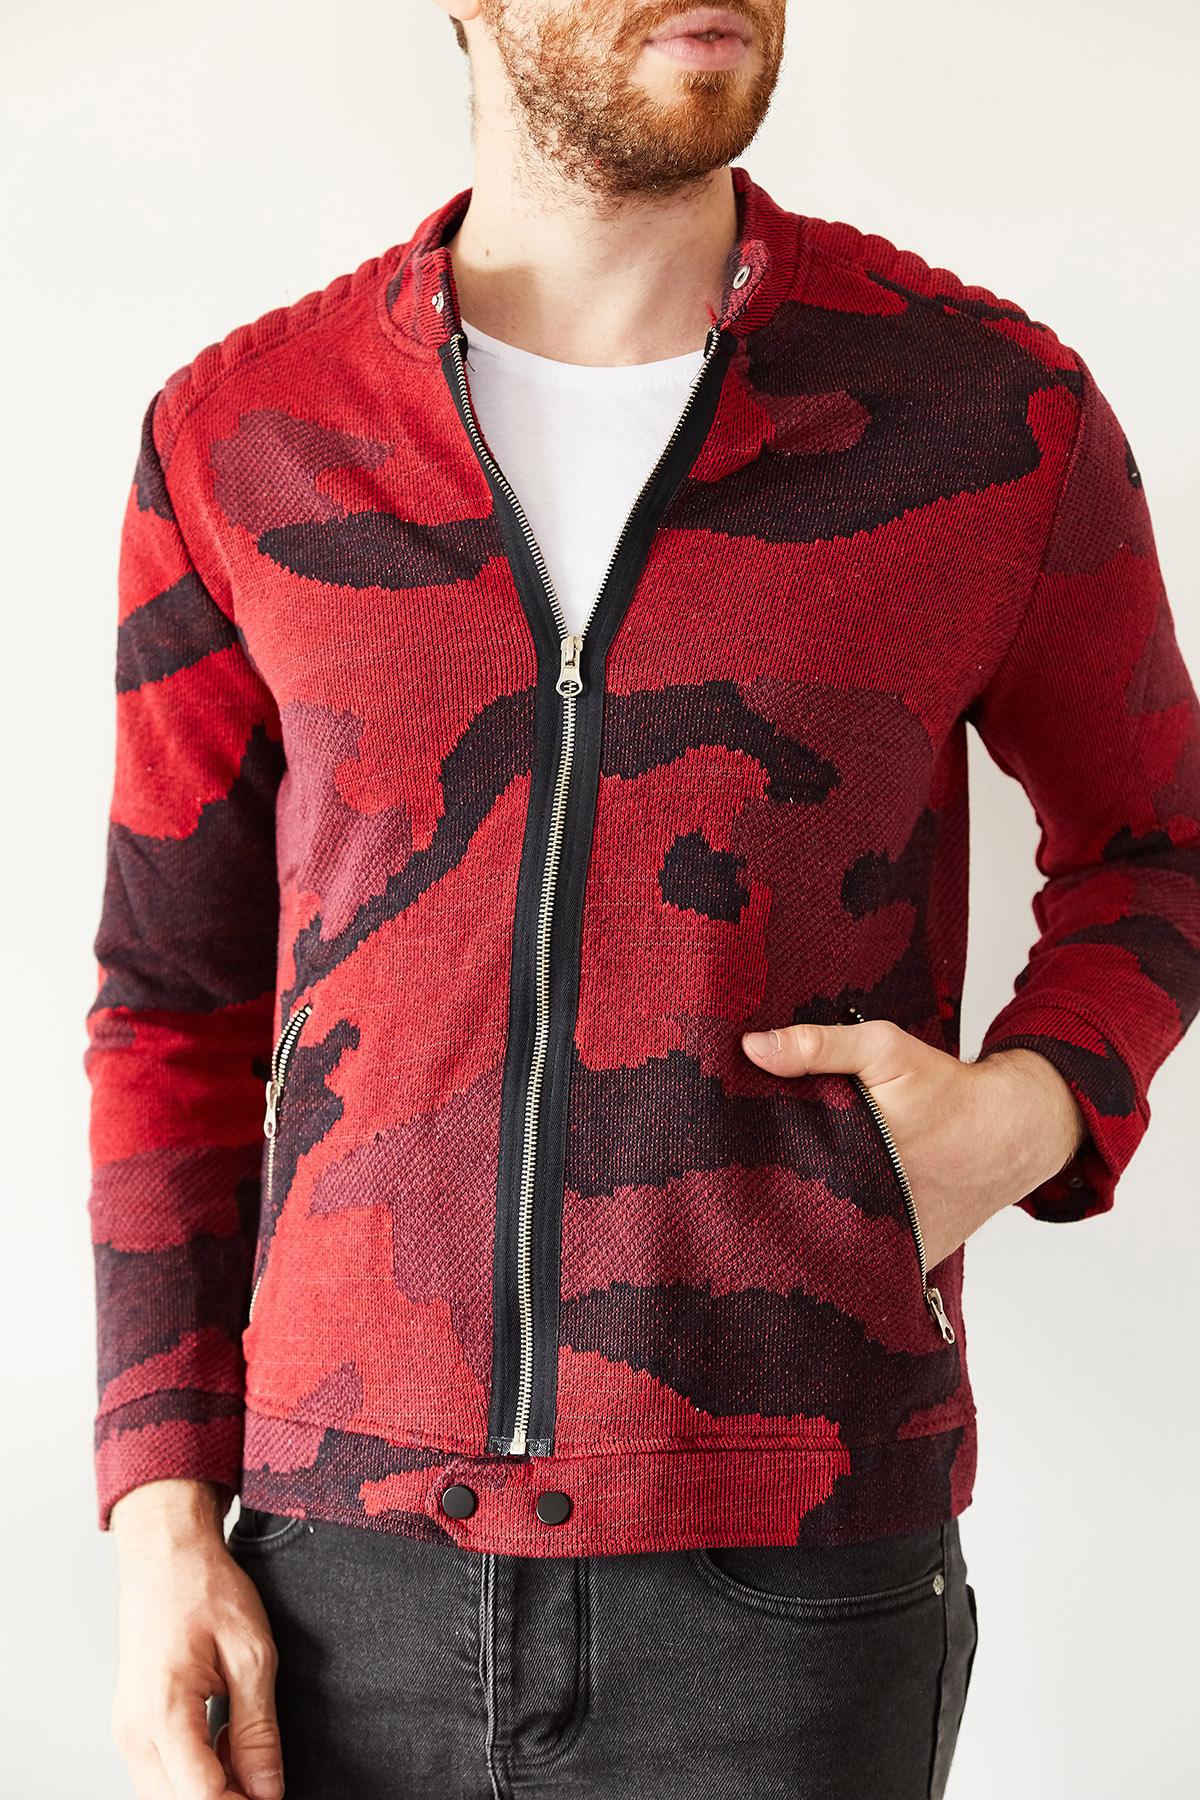 - Kırmızı Kamuflaj Desenli Ceket 1KXE8-44145-04